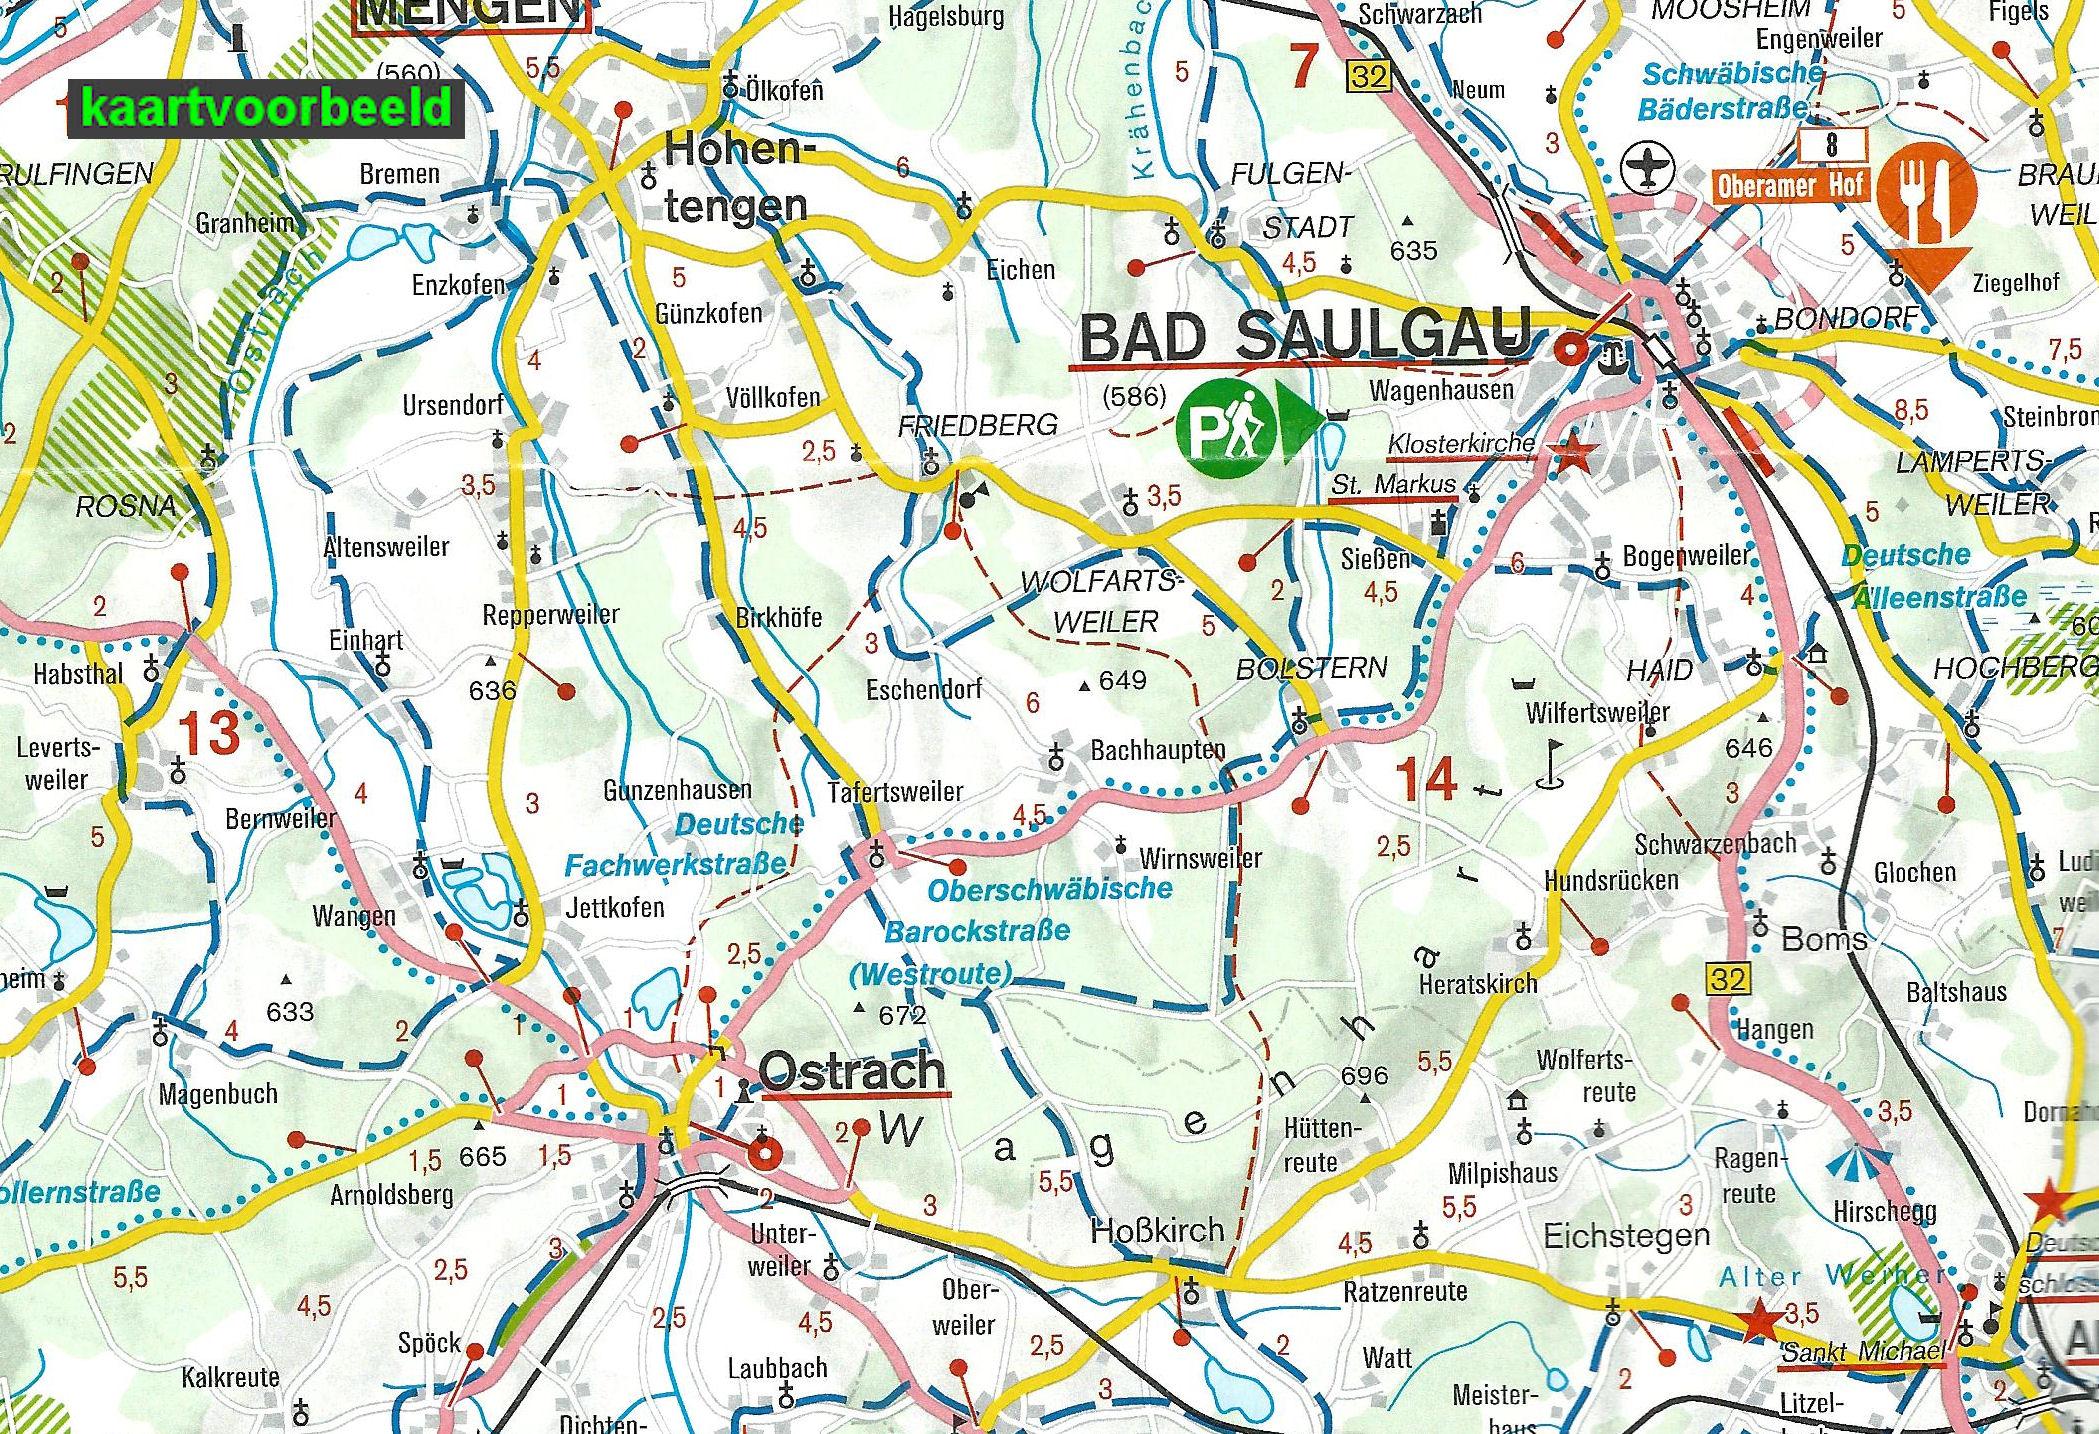 Wegenkaart Landkaart 05 Freizeitkarte Ostfriesland